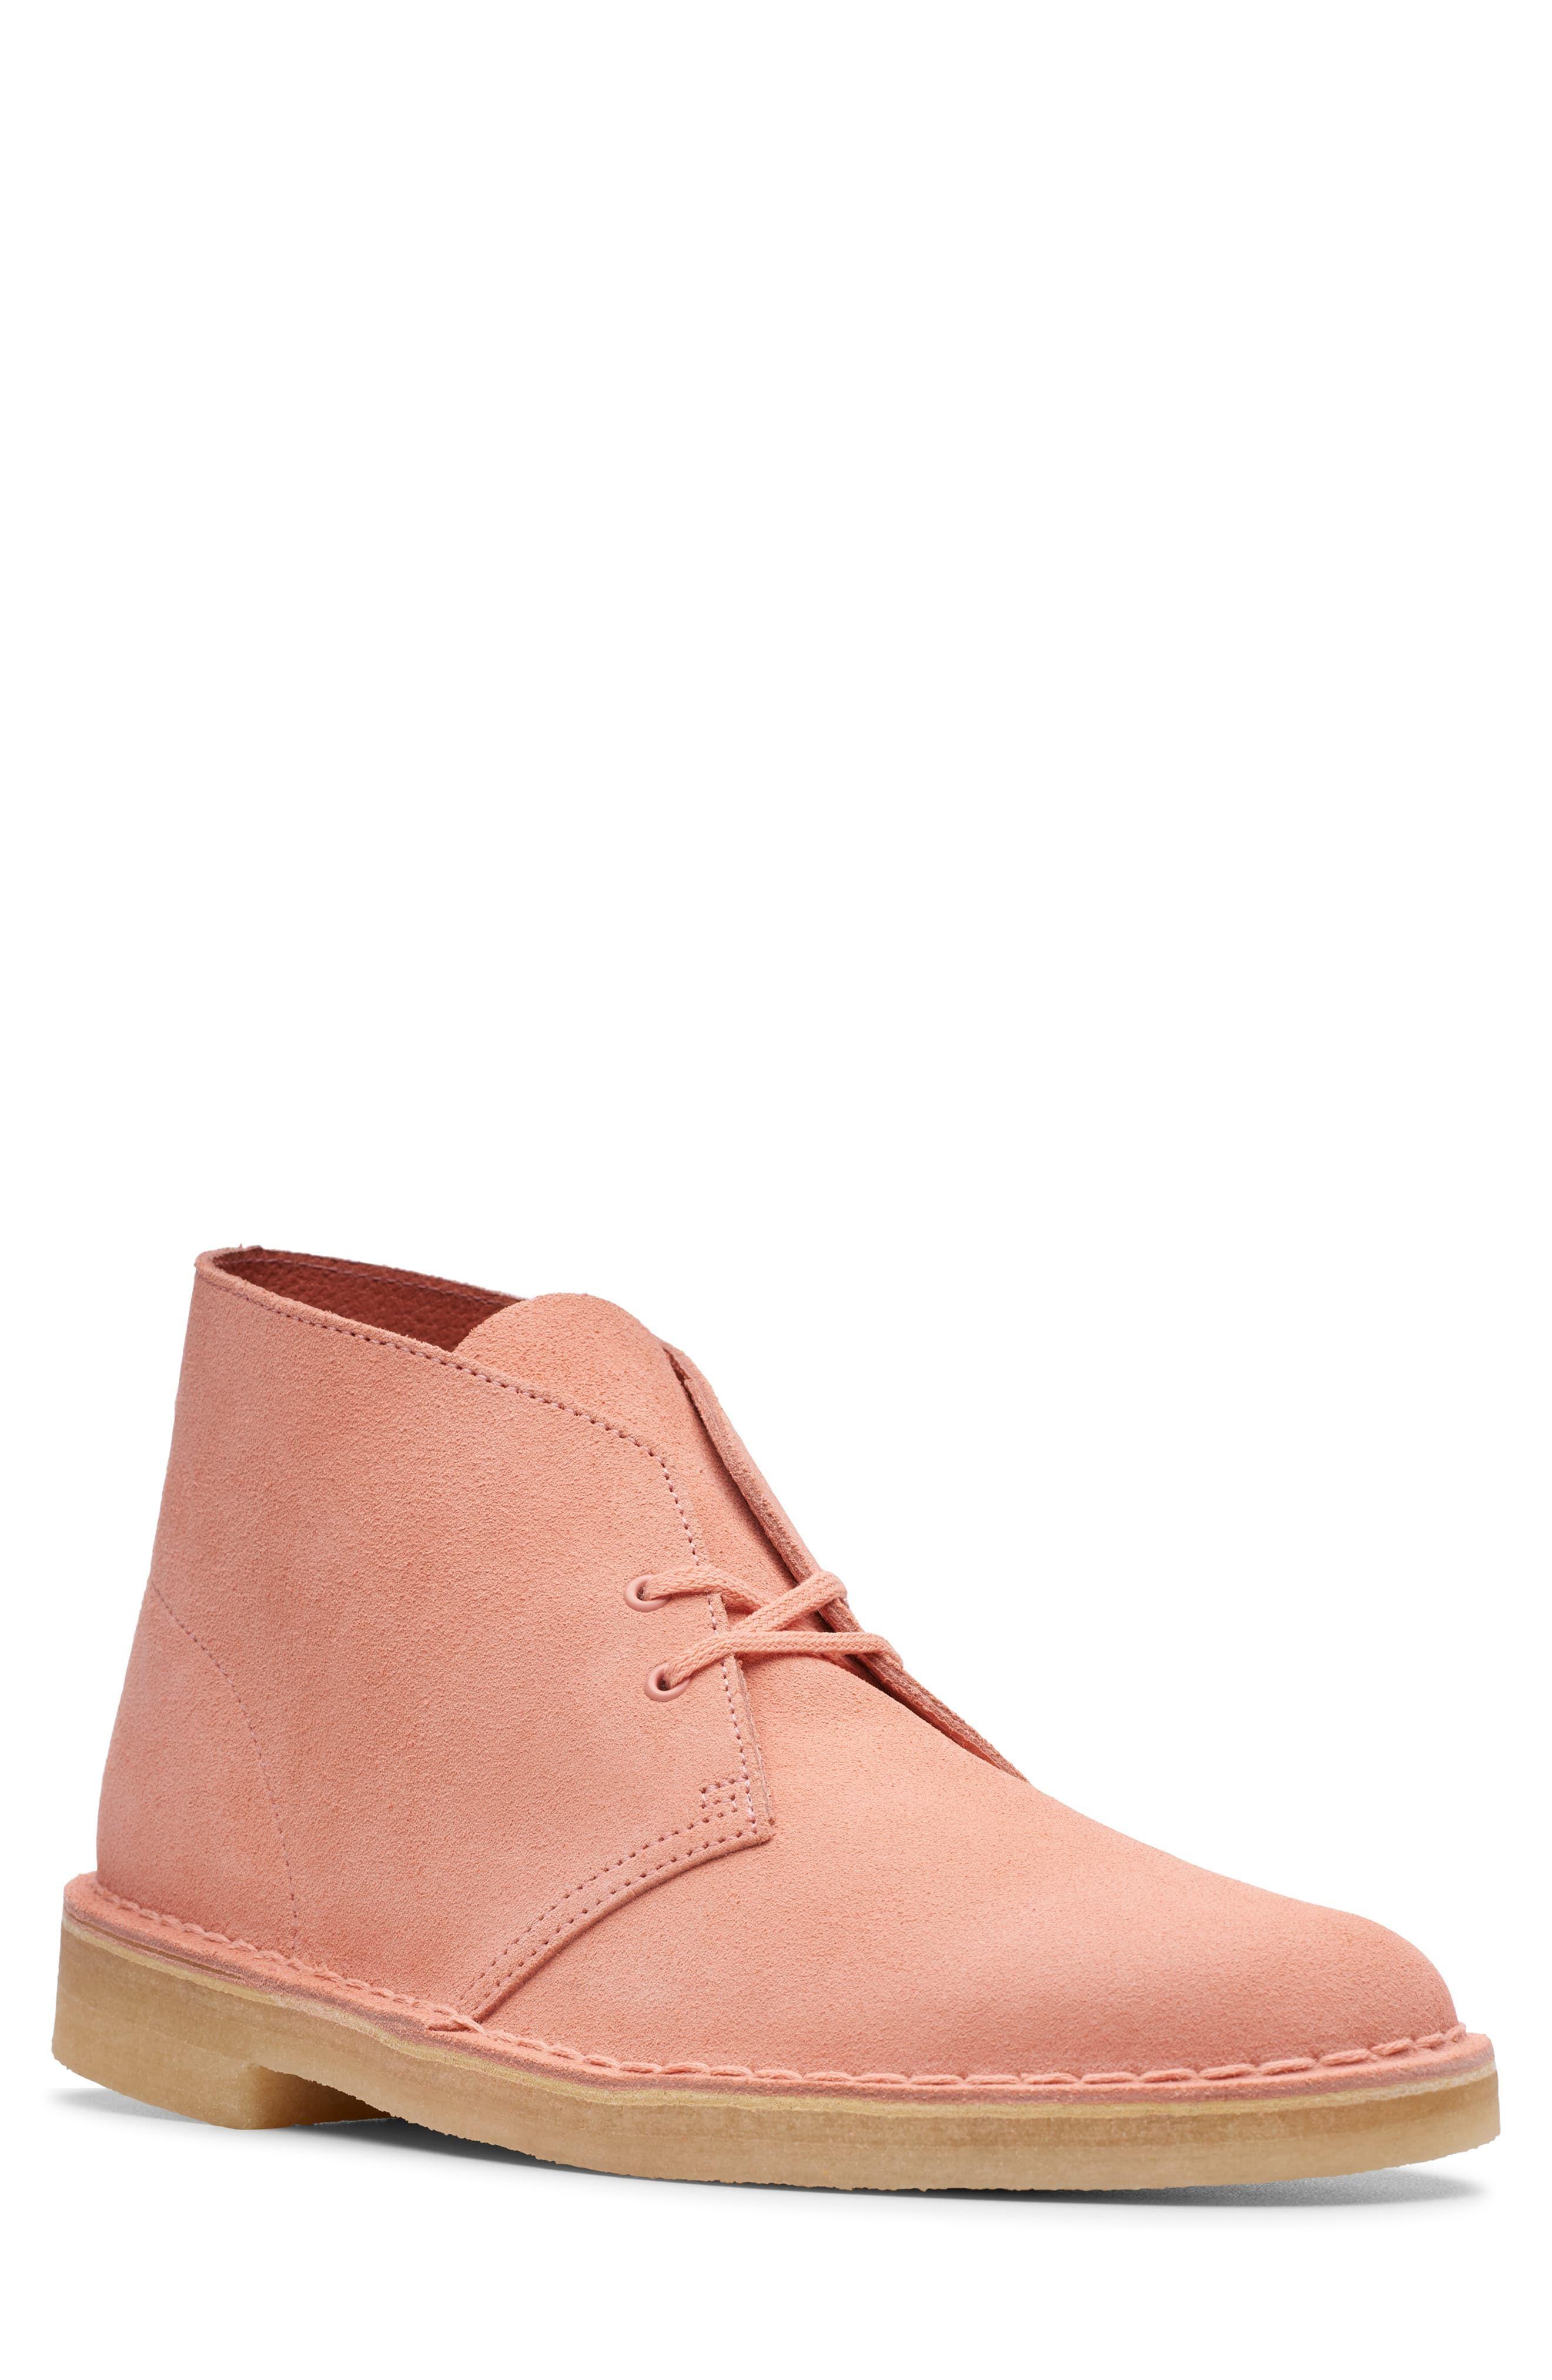 Calificación Nabo Palabra  Men's Clarks Originals 'Desert' Boot, Size 7 M - Pink | Desert boots, Clarks  desert boot, Boots